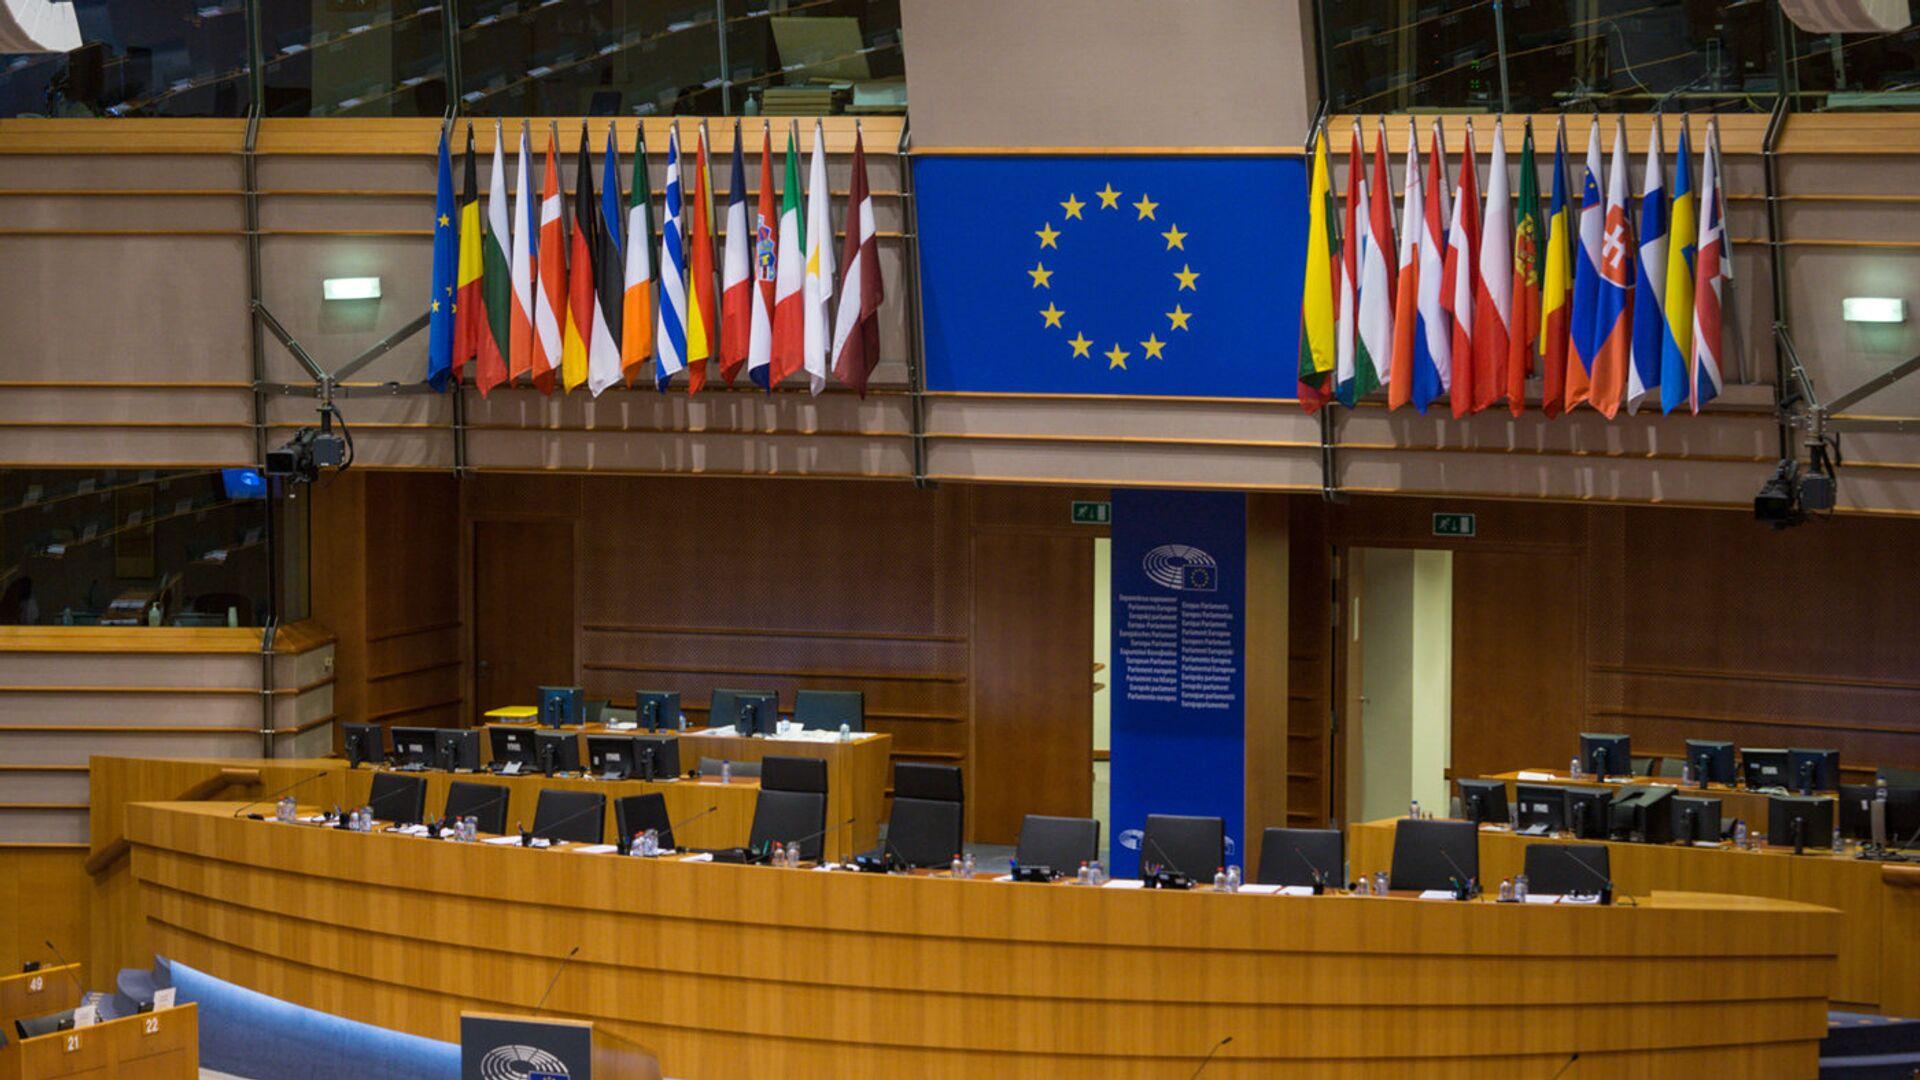 Зал заседаний Европарламента - Sputnik Латвия, 1920, 15.07.2021